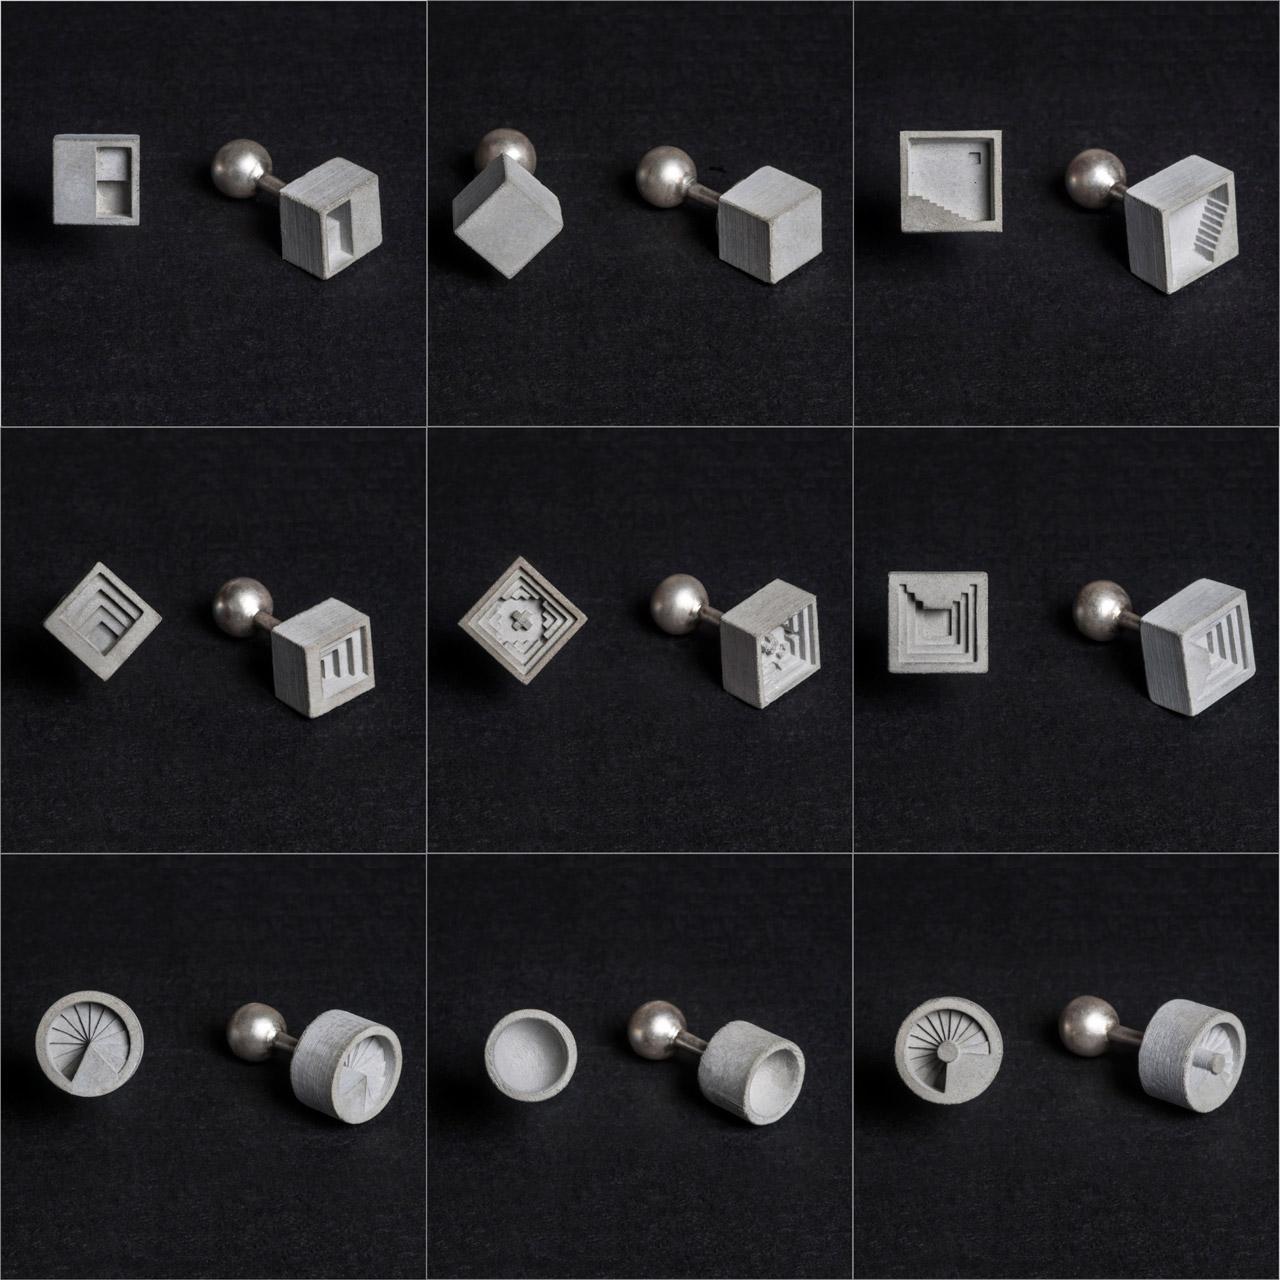 Material-Immaterial-Elements-cufflinks-hisheji (21)